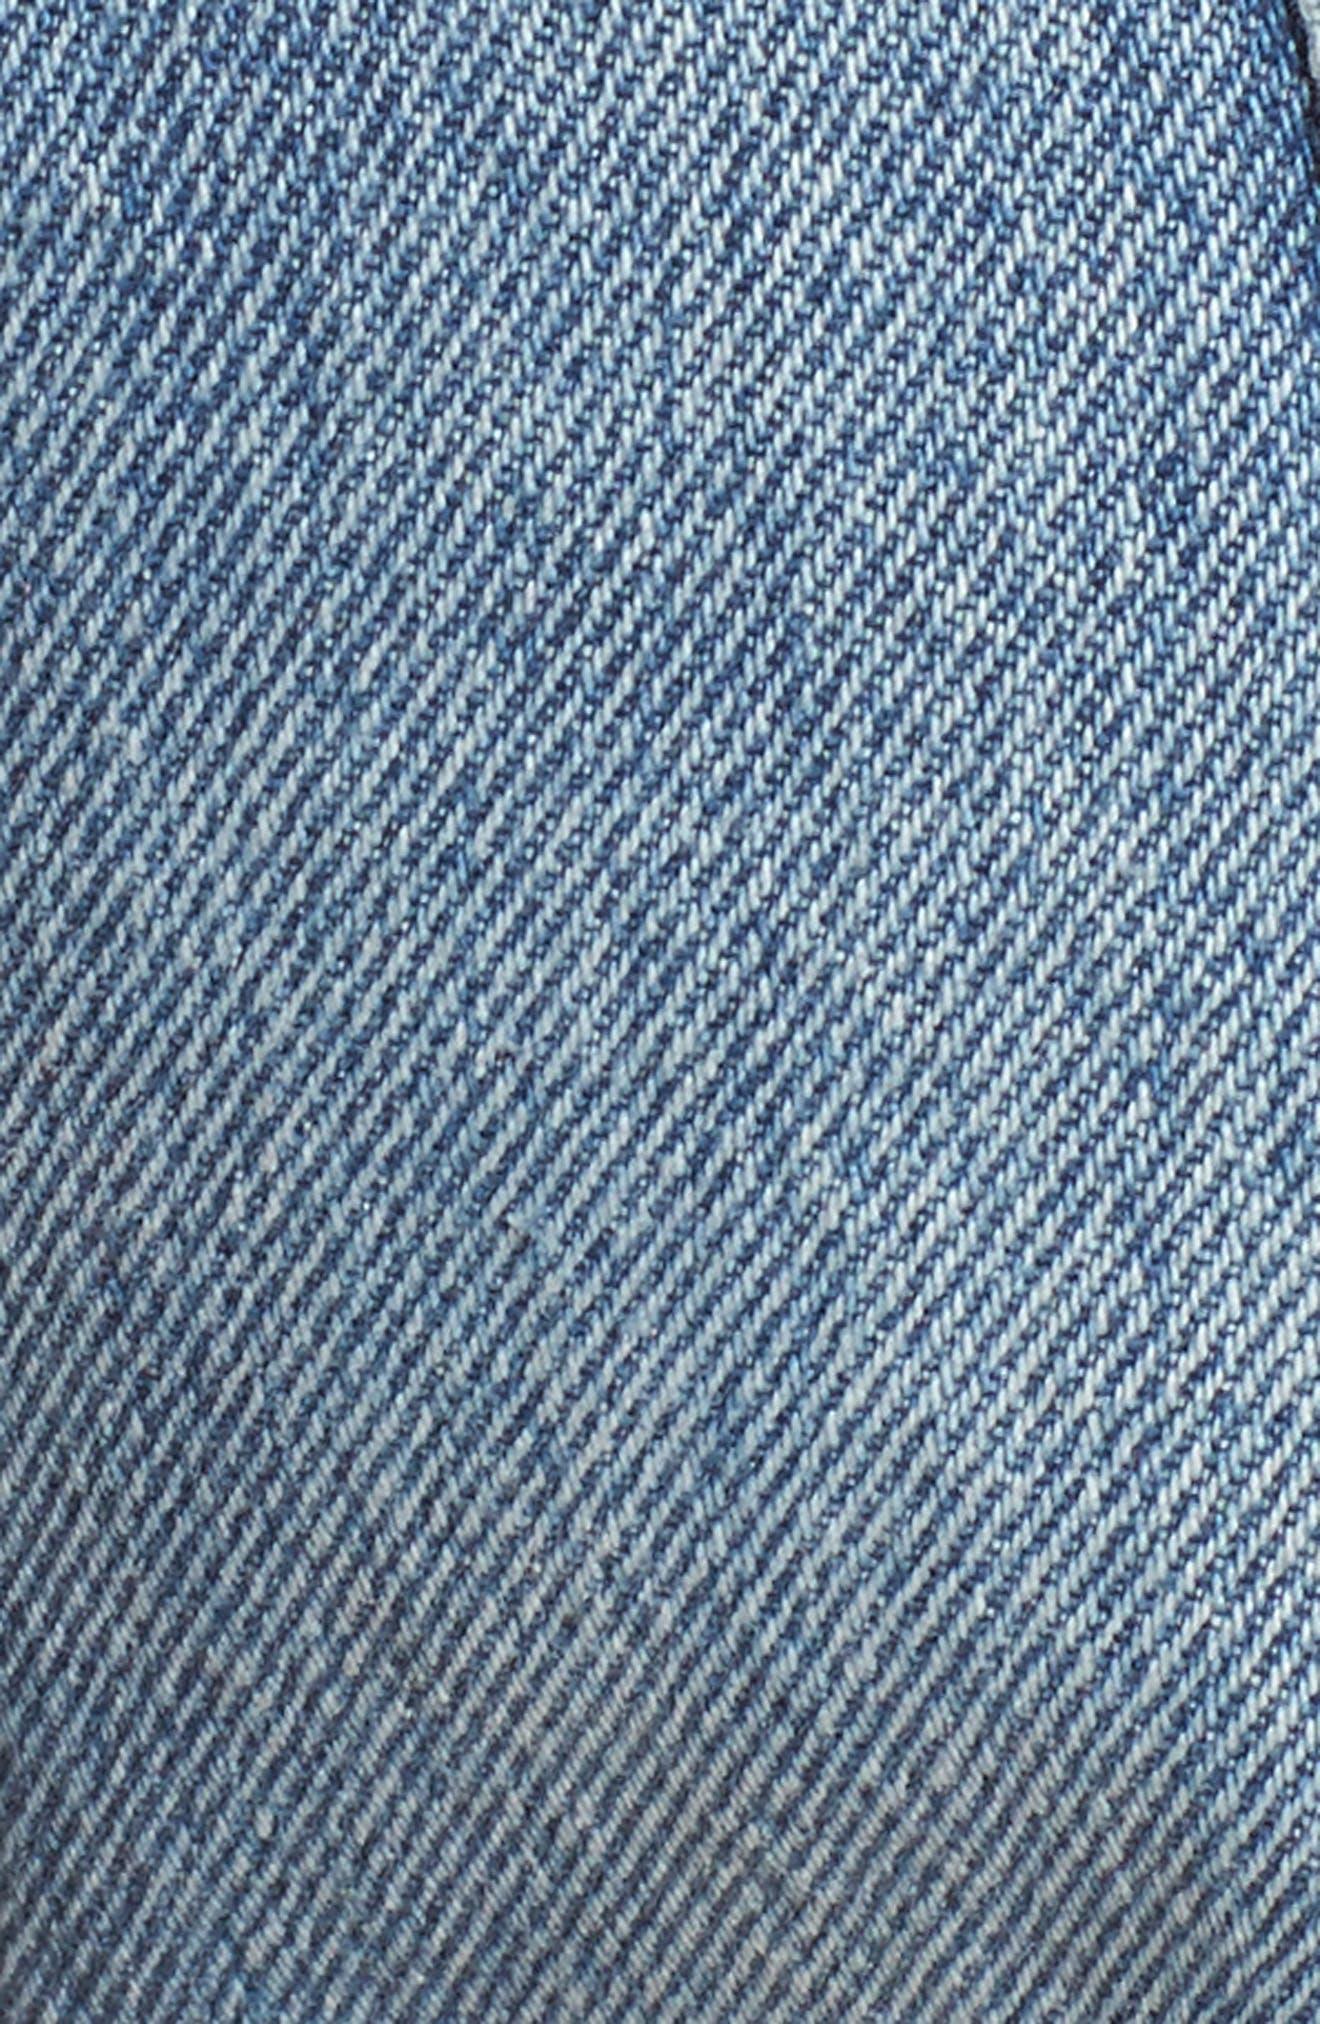 Cutoff Denim Shorts,                             Alternate thumbnail 5, color,                             400